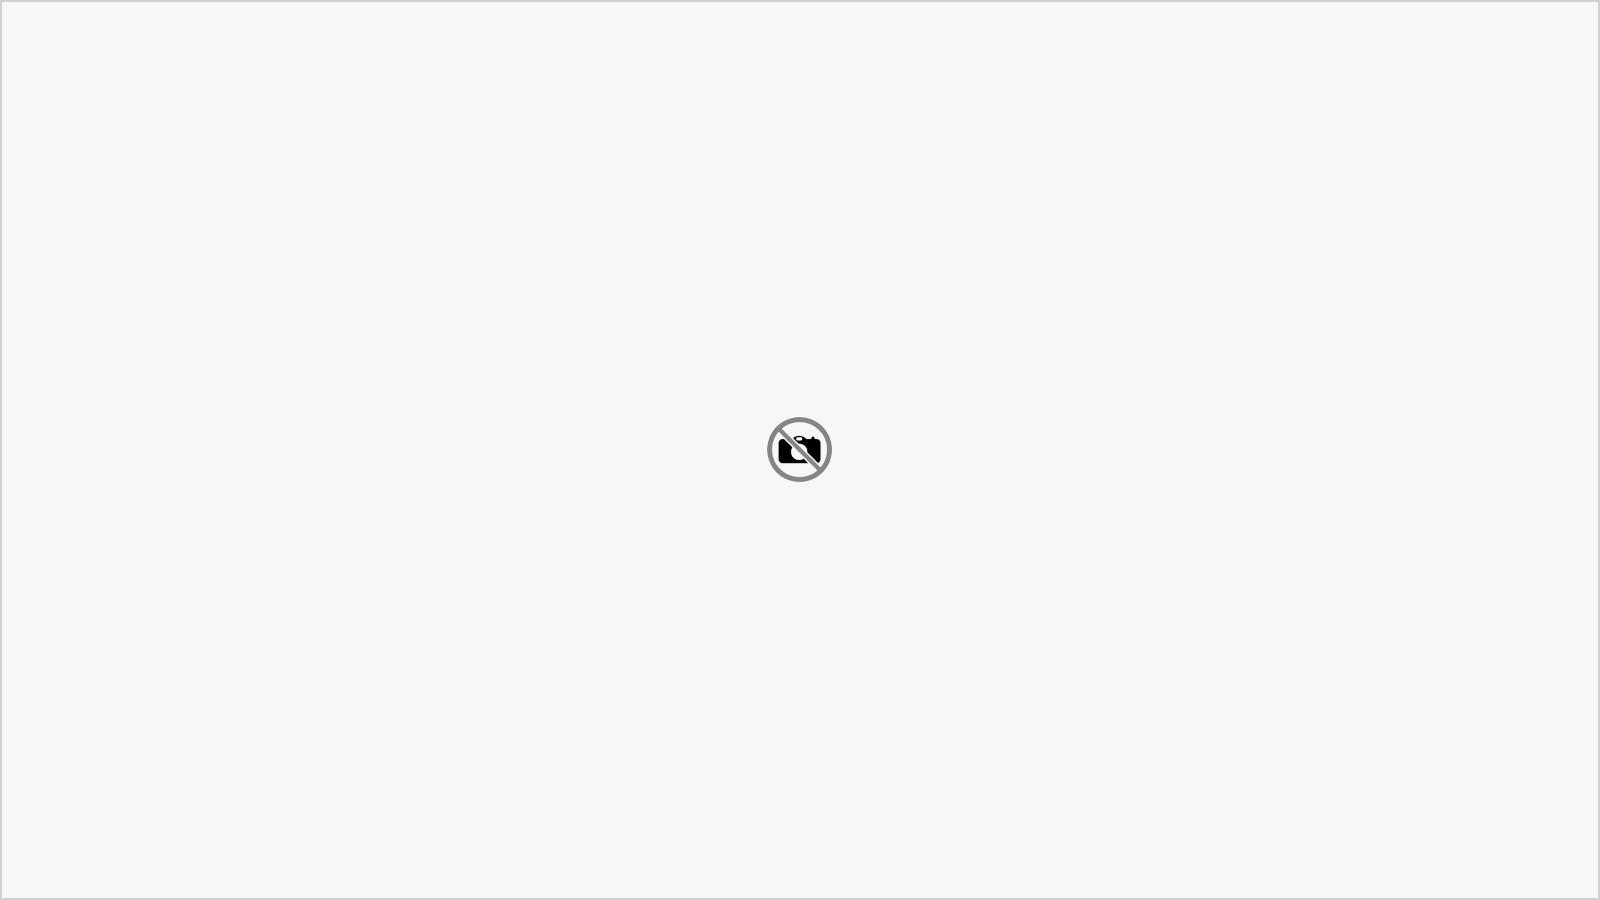 Lista de ferias en 2015 la actualidad courant for Salon rexel